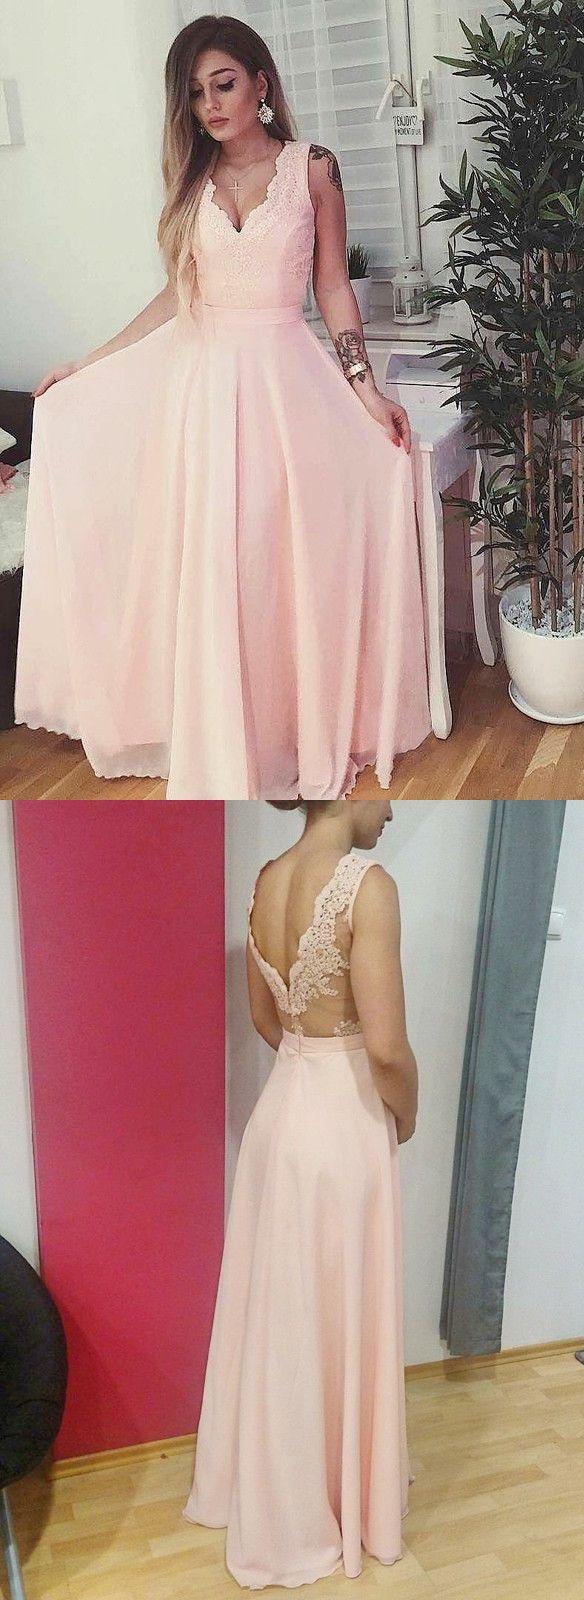 Pink Chiffon Long Prom Dress with Side Slit | Prom | Pinterest ...